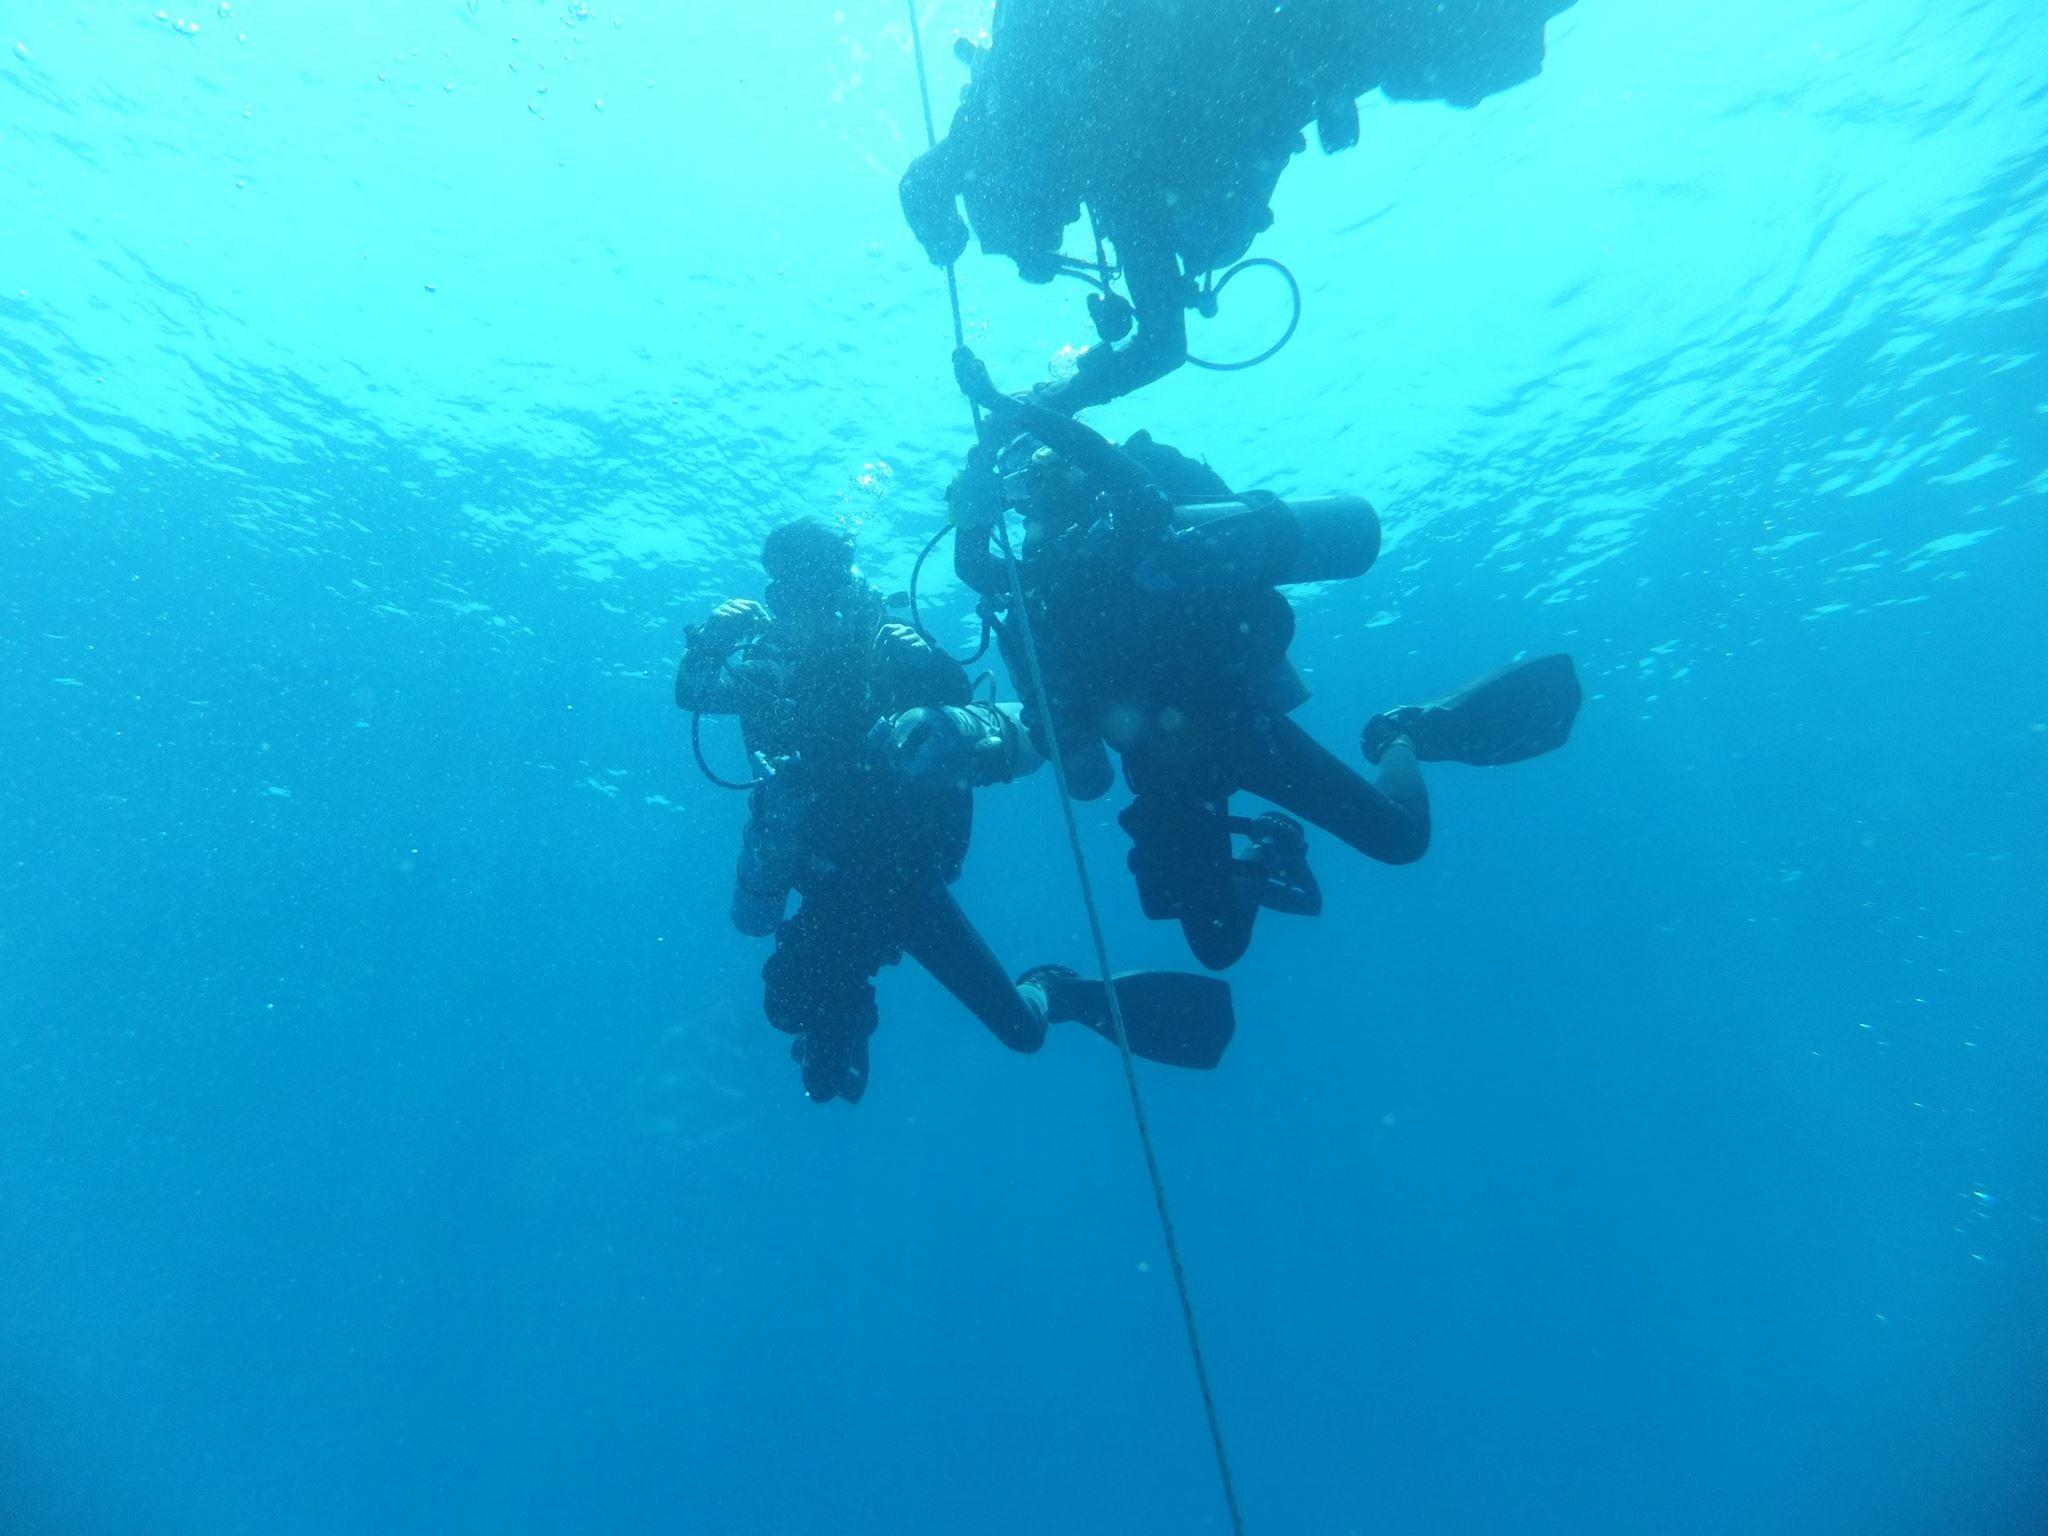 DJL tech crew near the surface